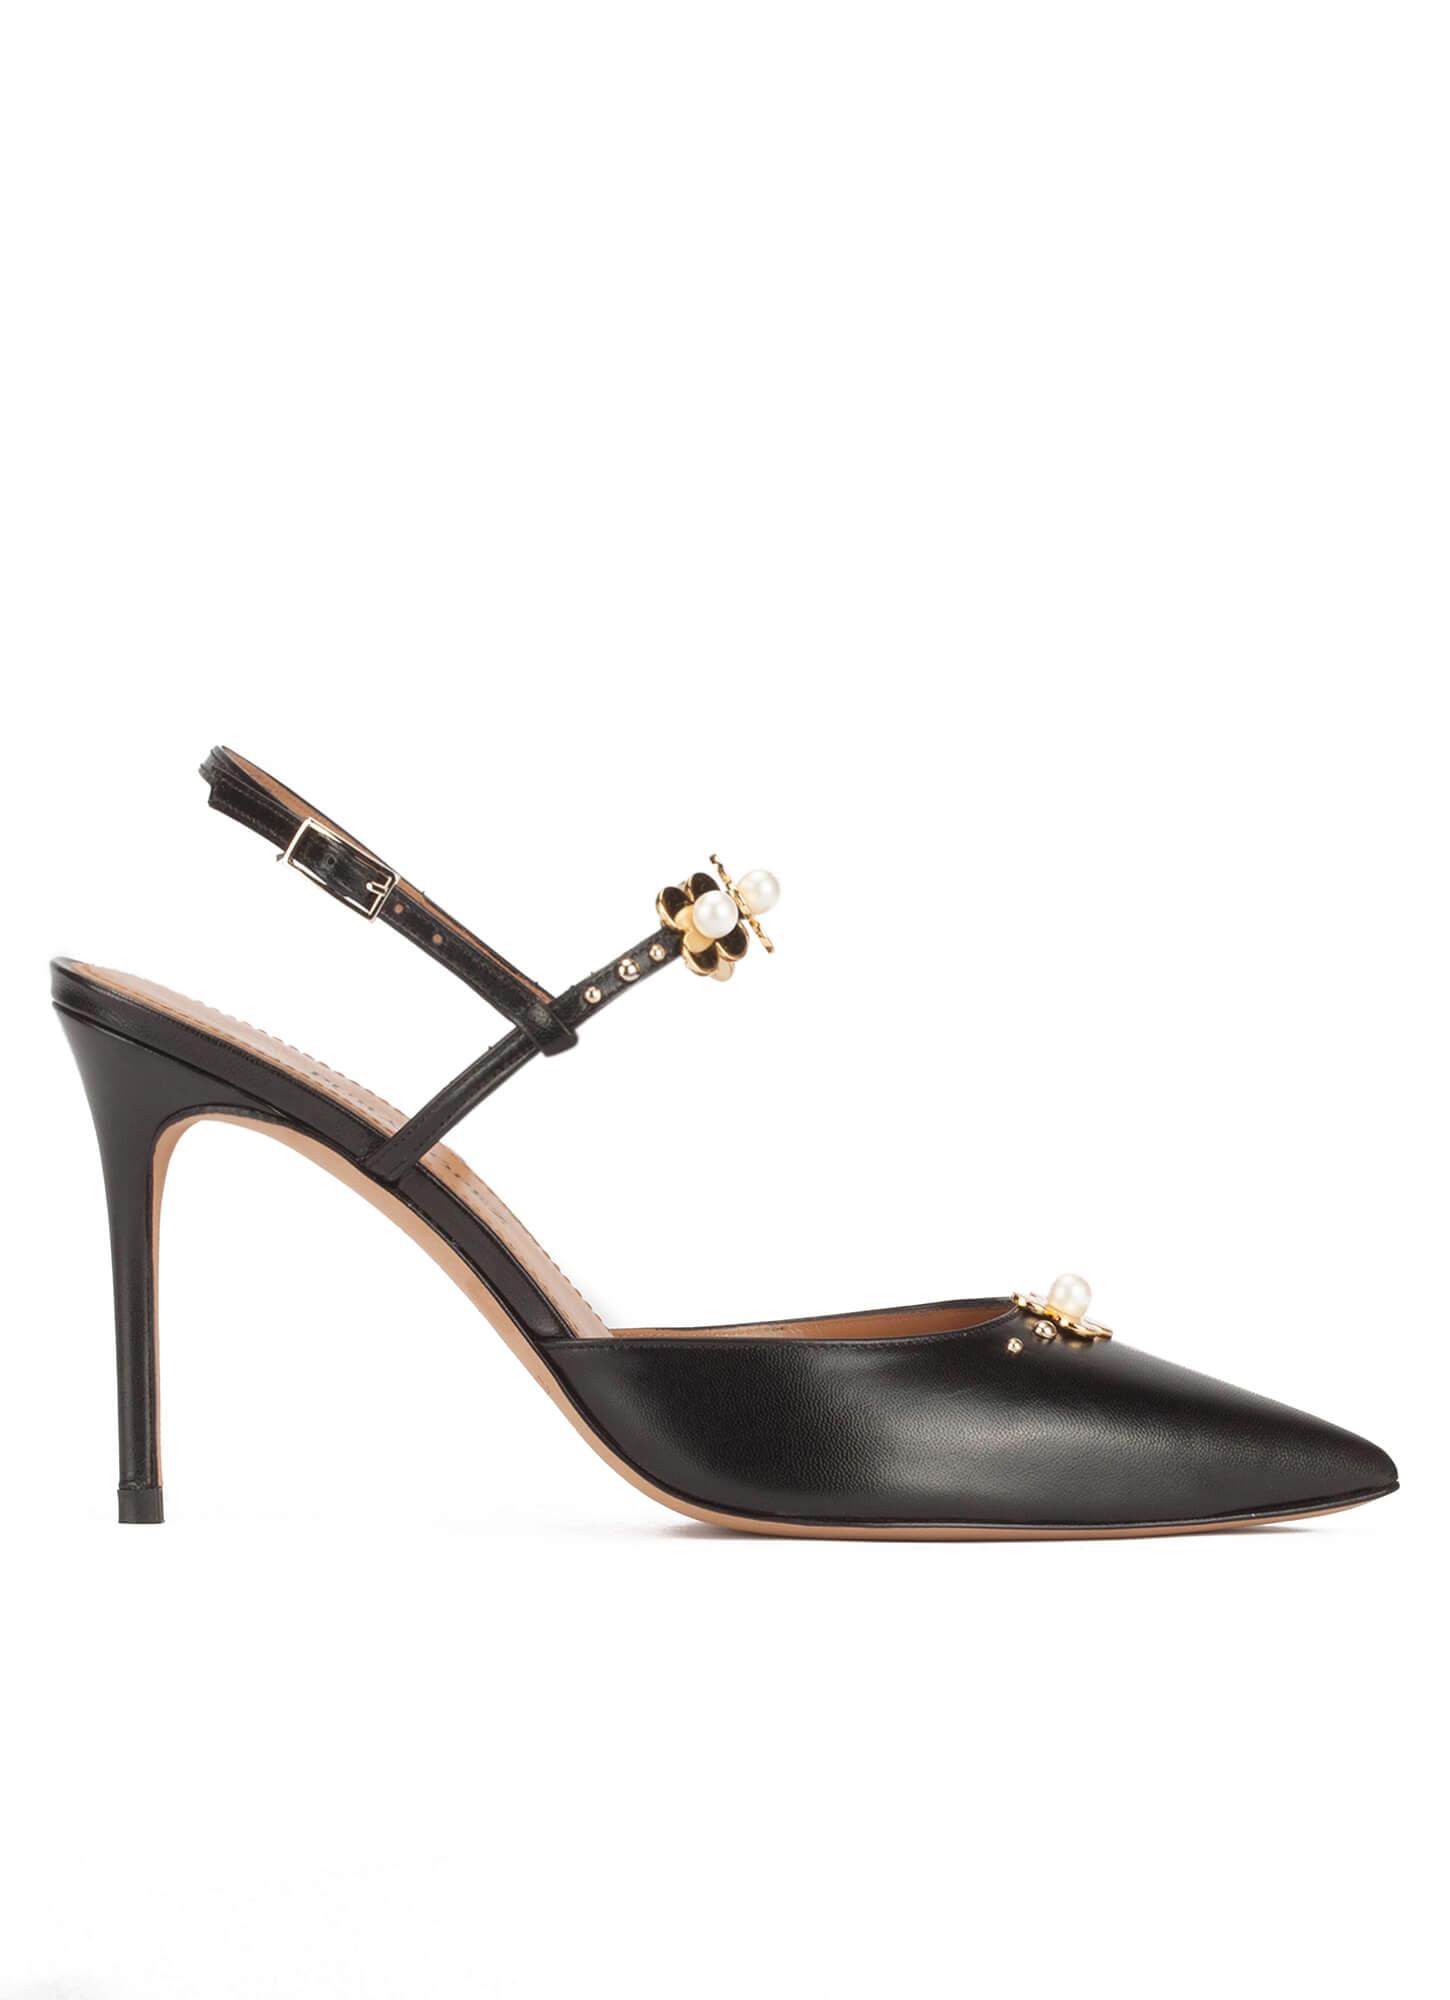 Flores Negro En Destalonados Zapatos Con Piel Color Altos Lopez Pura gwRqxBO